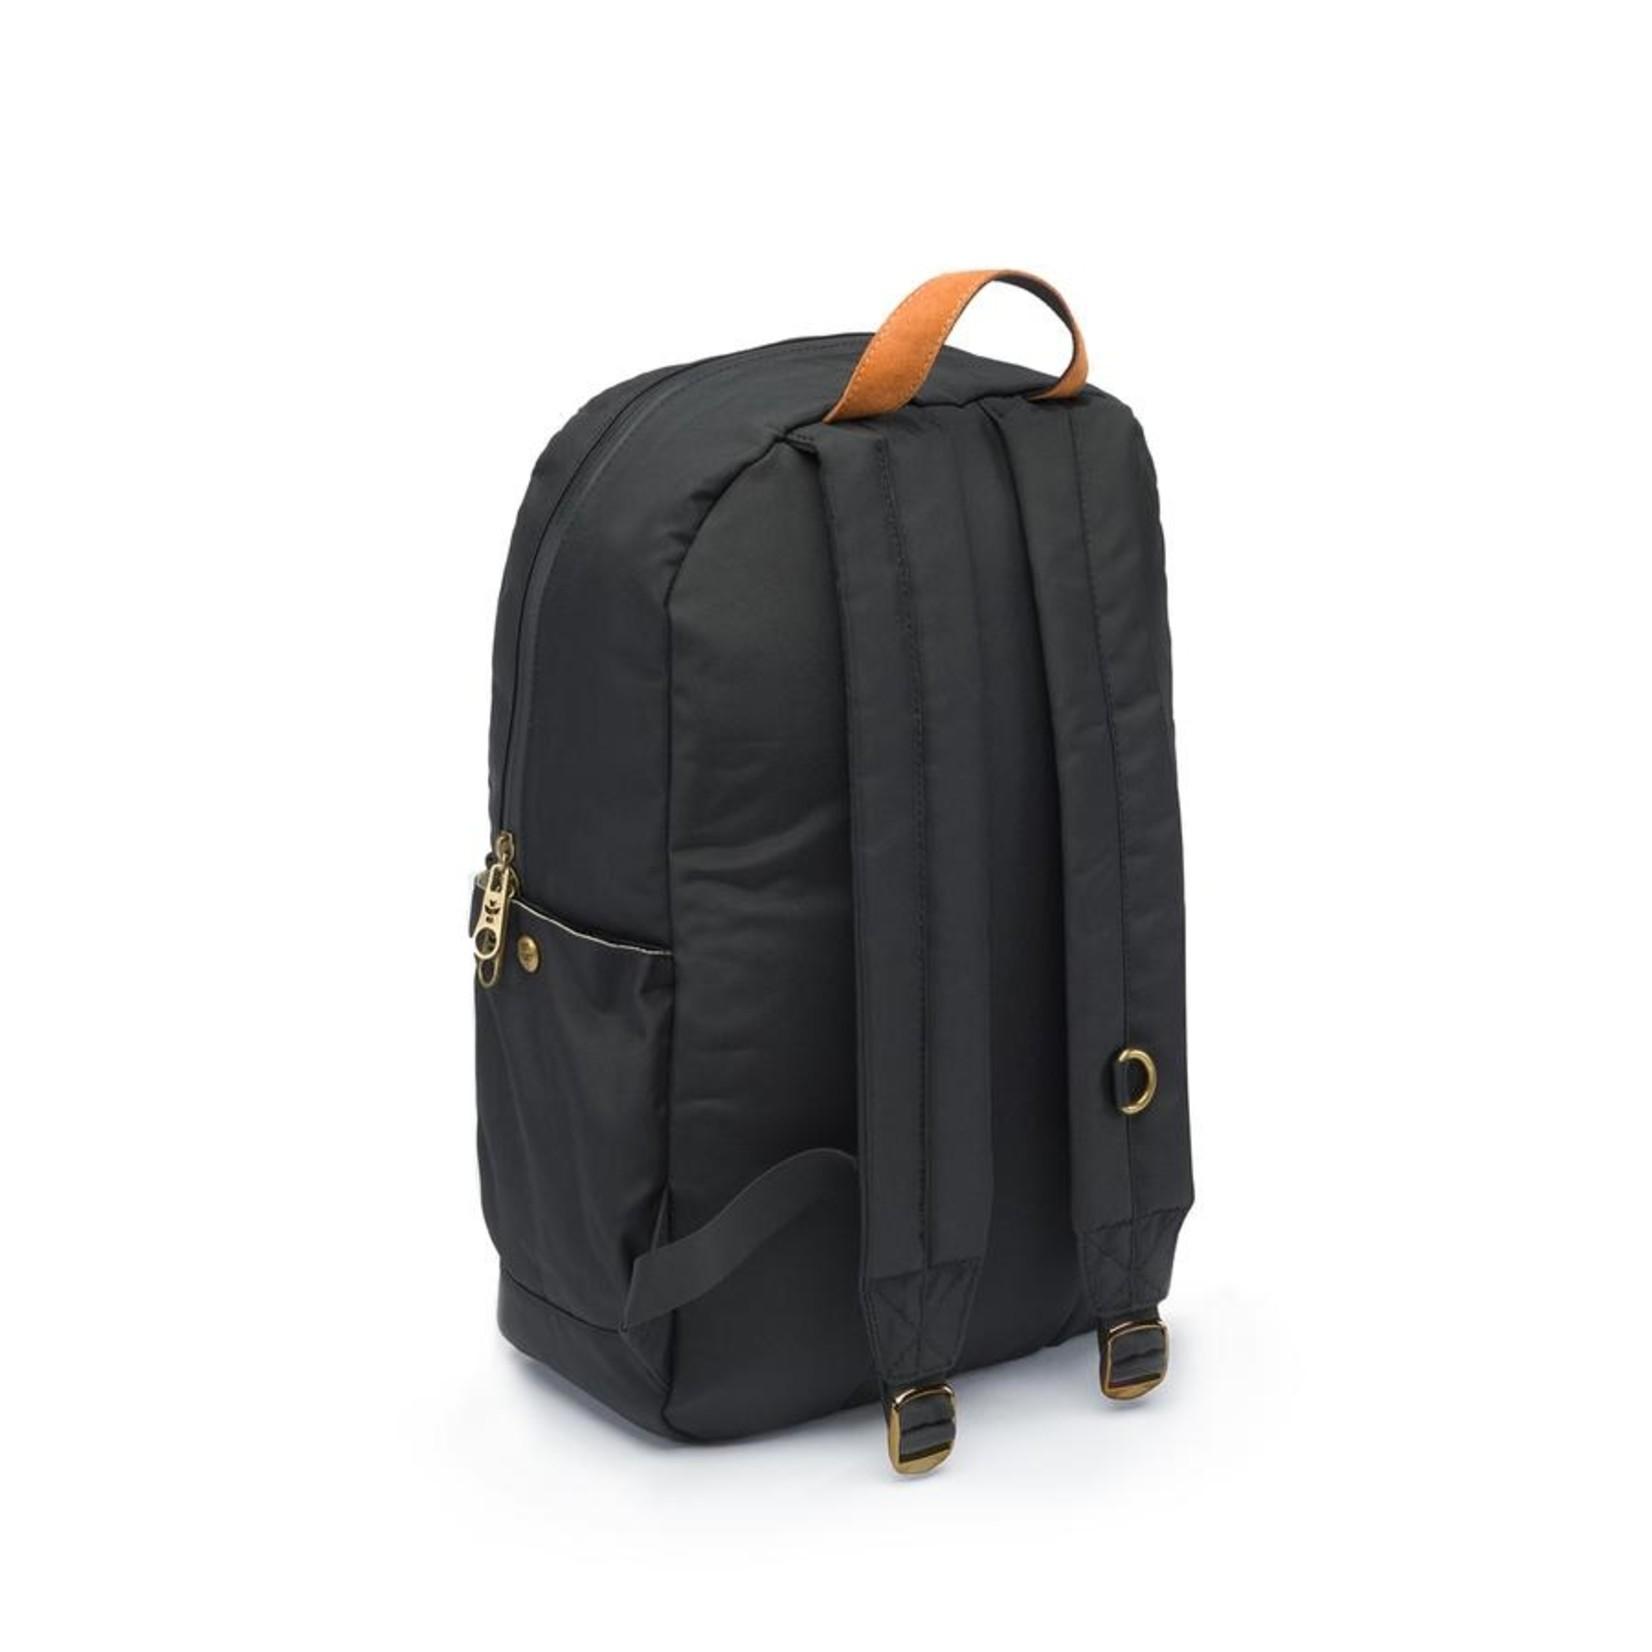 REVELRY THE ESCORT BAG